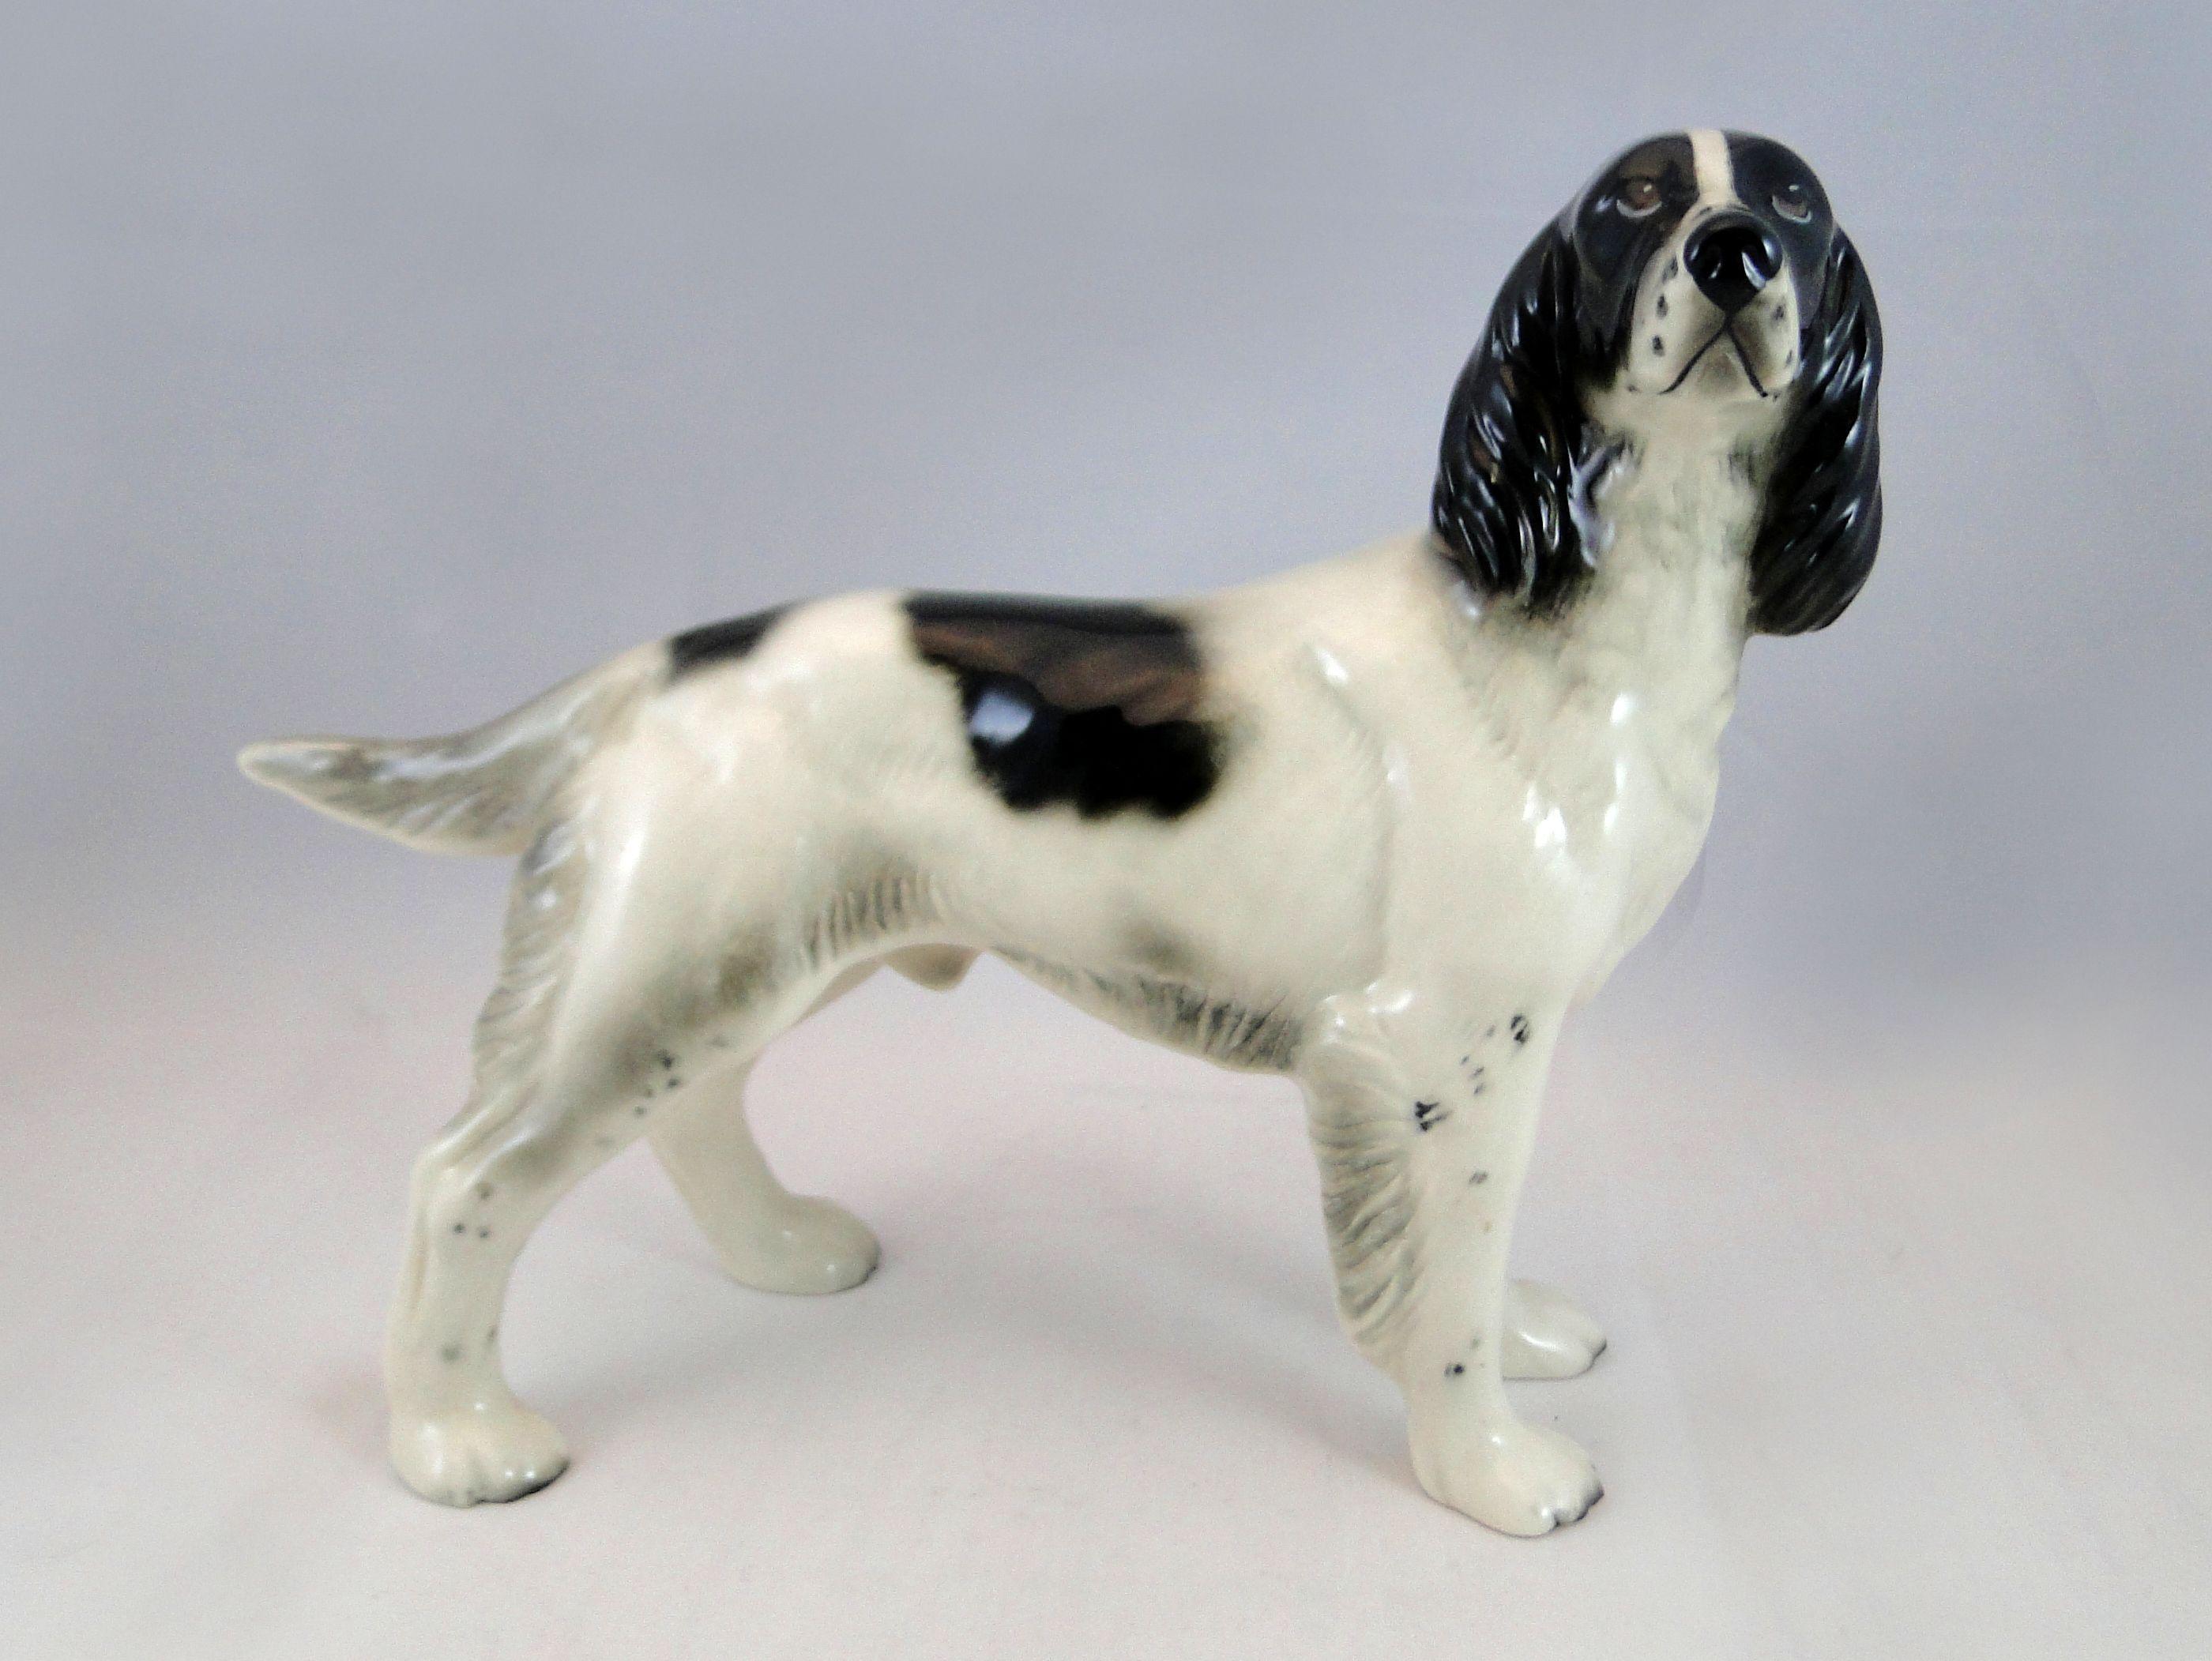 284 Vintage Ceramic Figure Of A Standing Springer Spaniel 18cms Tall Est 15 25 Porcelain Dog Spaniel Animals